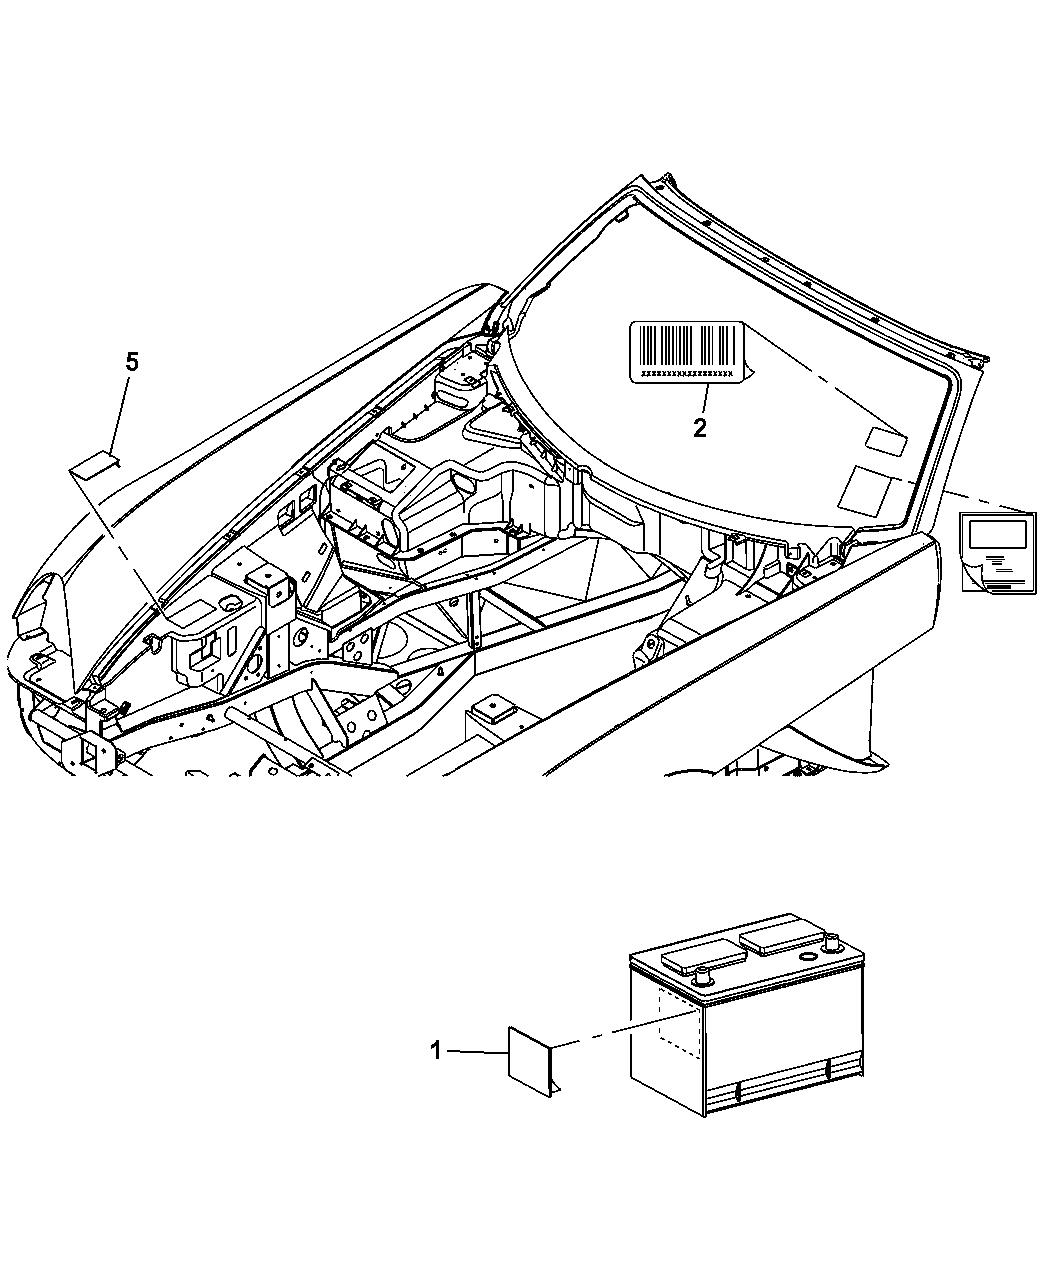 2008 Dodge Viper Engine Compartt - Mopar Parts Giant